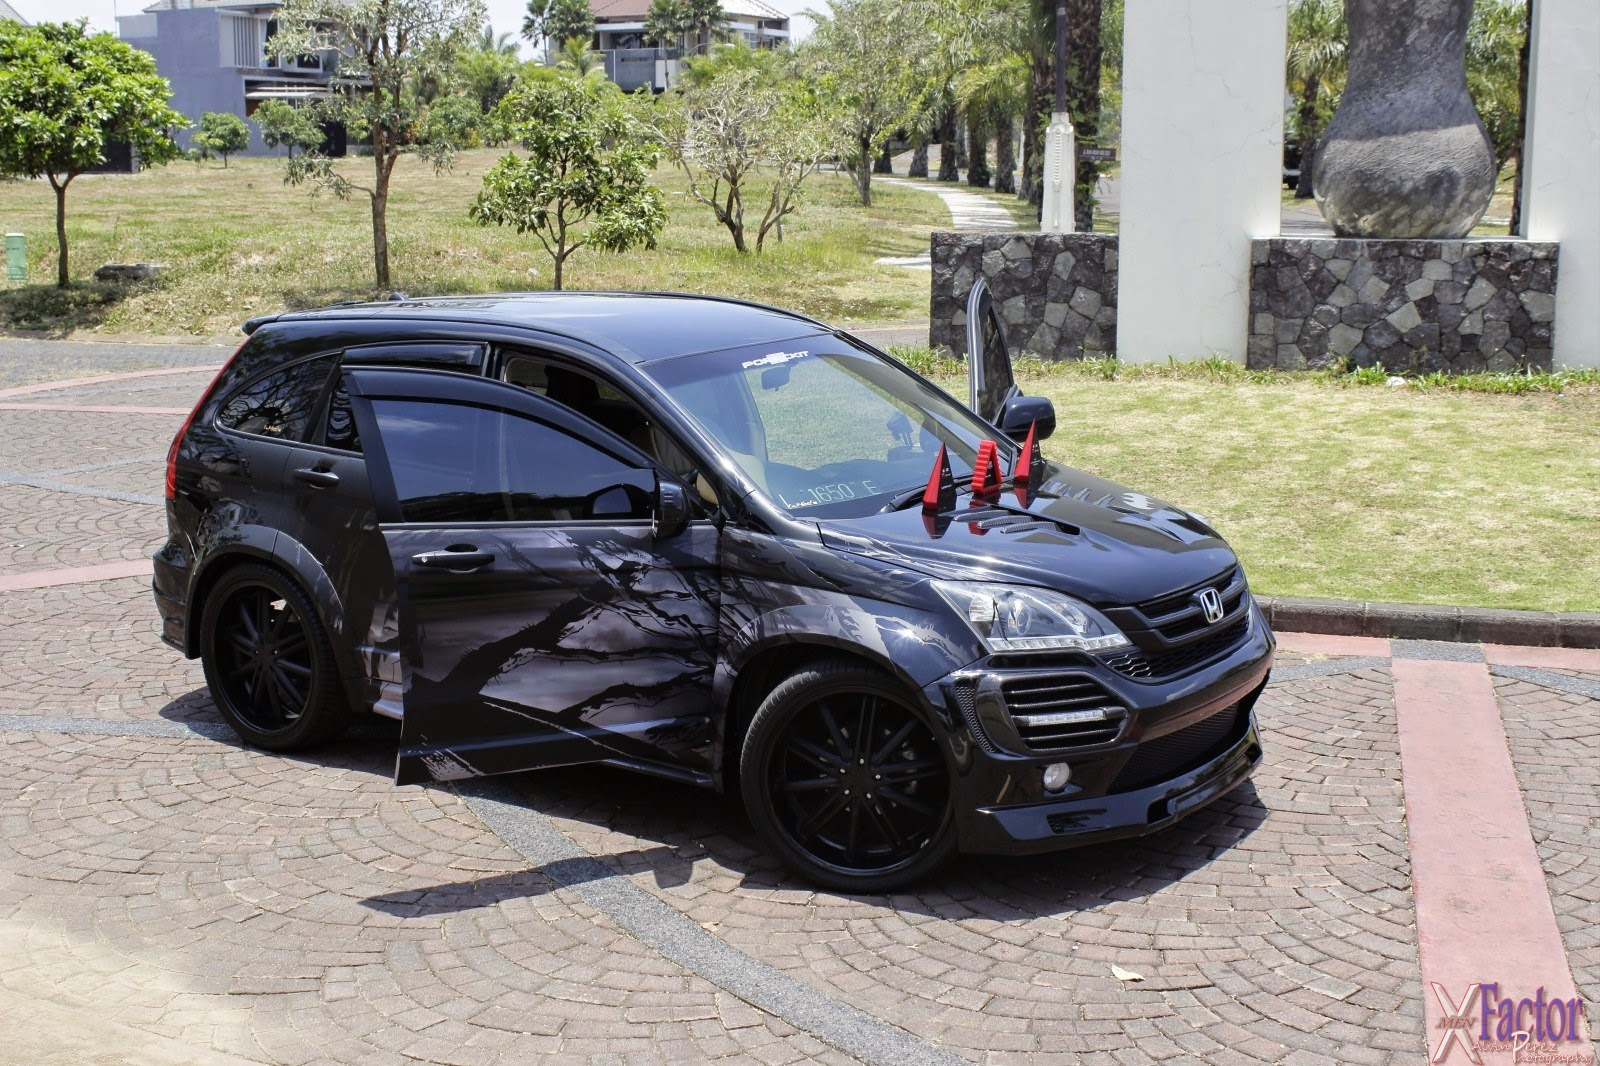 modifikasi mobil honda crv hitam